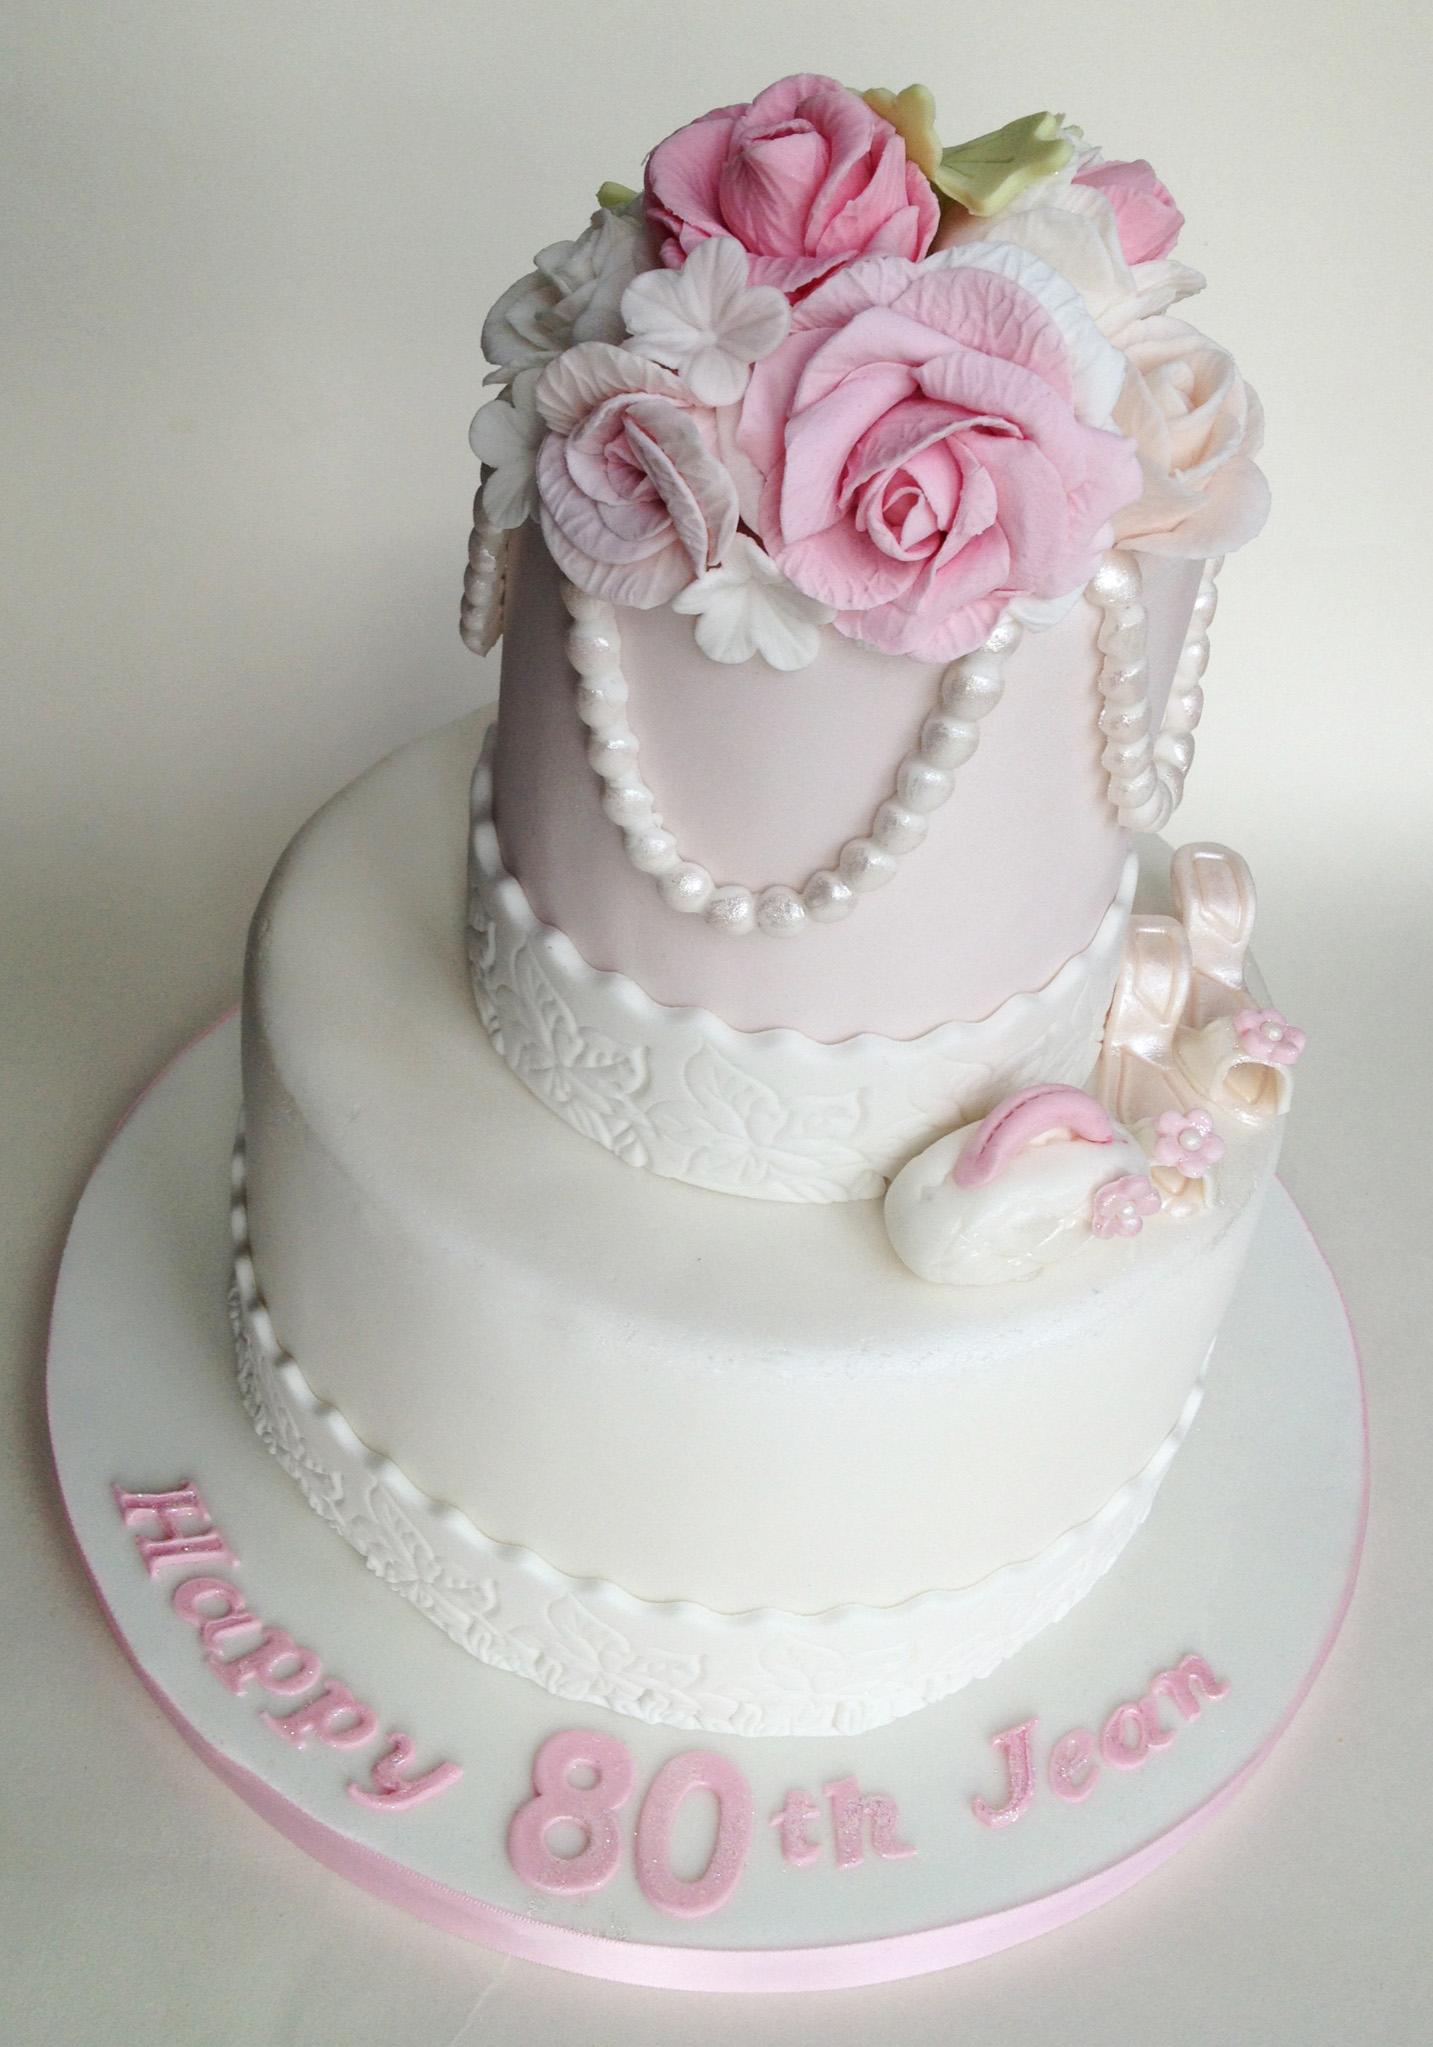 12 Pretty 80th Birthday Cakes Photo Fishbowl Birthday Cake The